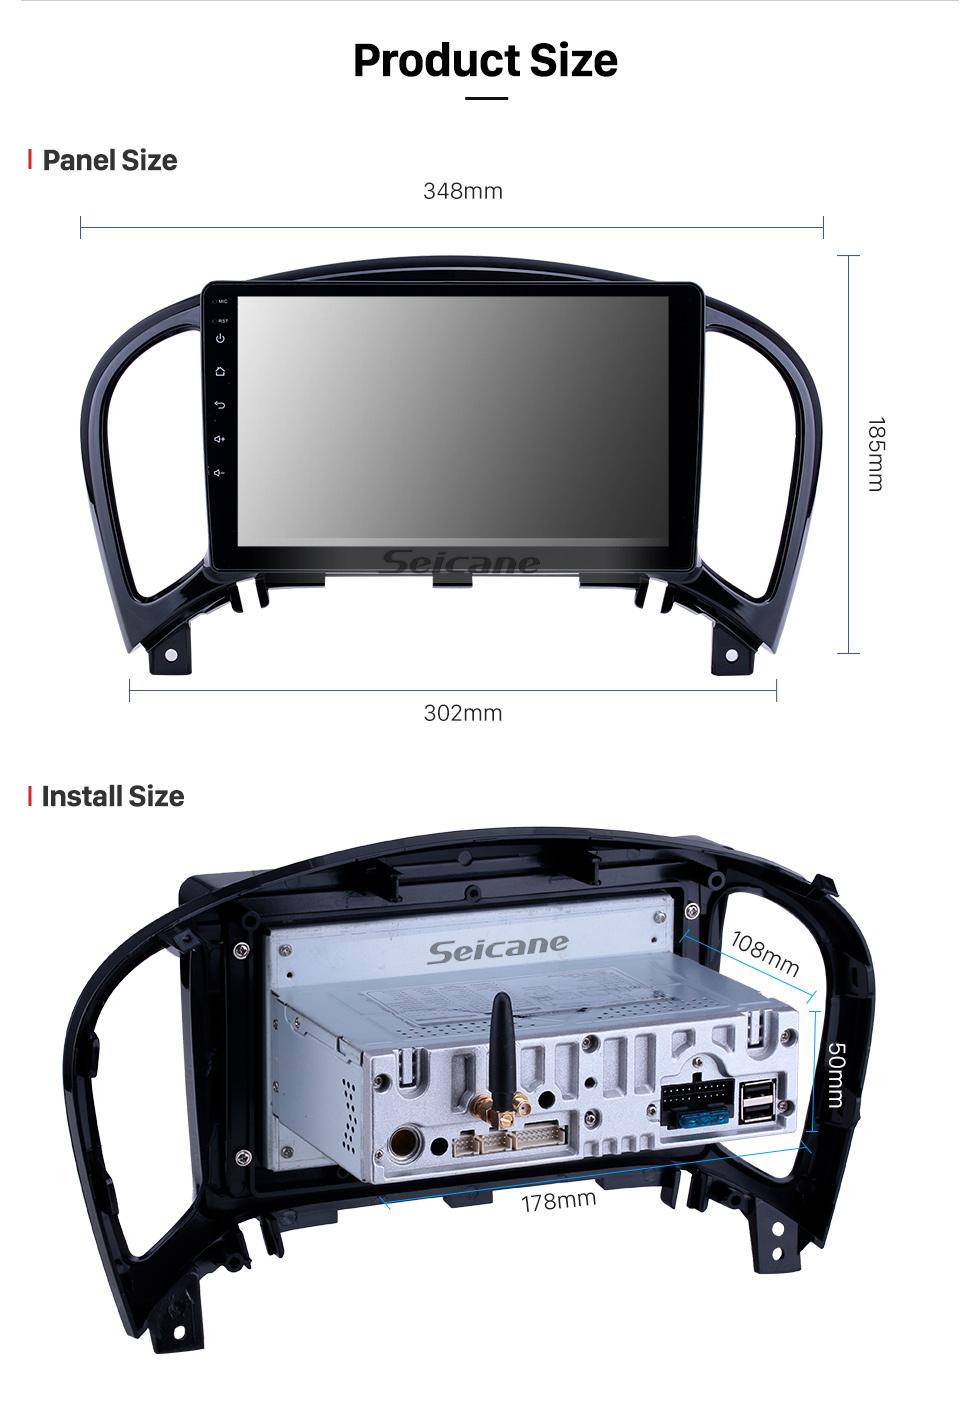 Seicane HD Touchscreen 2011-2016 Nissan Infiniti ESQ/Juke Android 9.0 9 inch GPS Navigation Radio Bluetooth USB WIFI Carplay support DAB+ TPMS OBD2